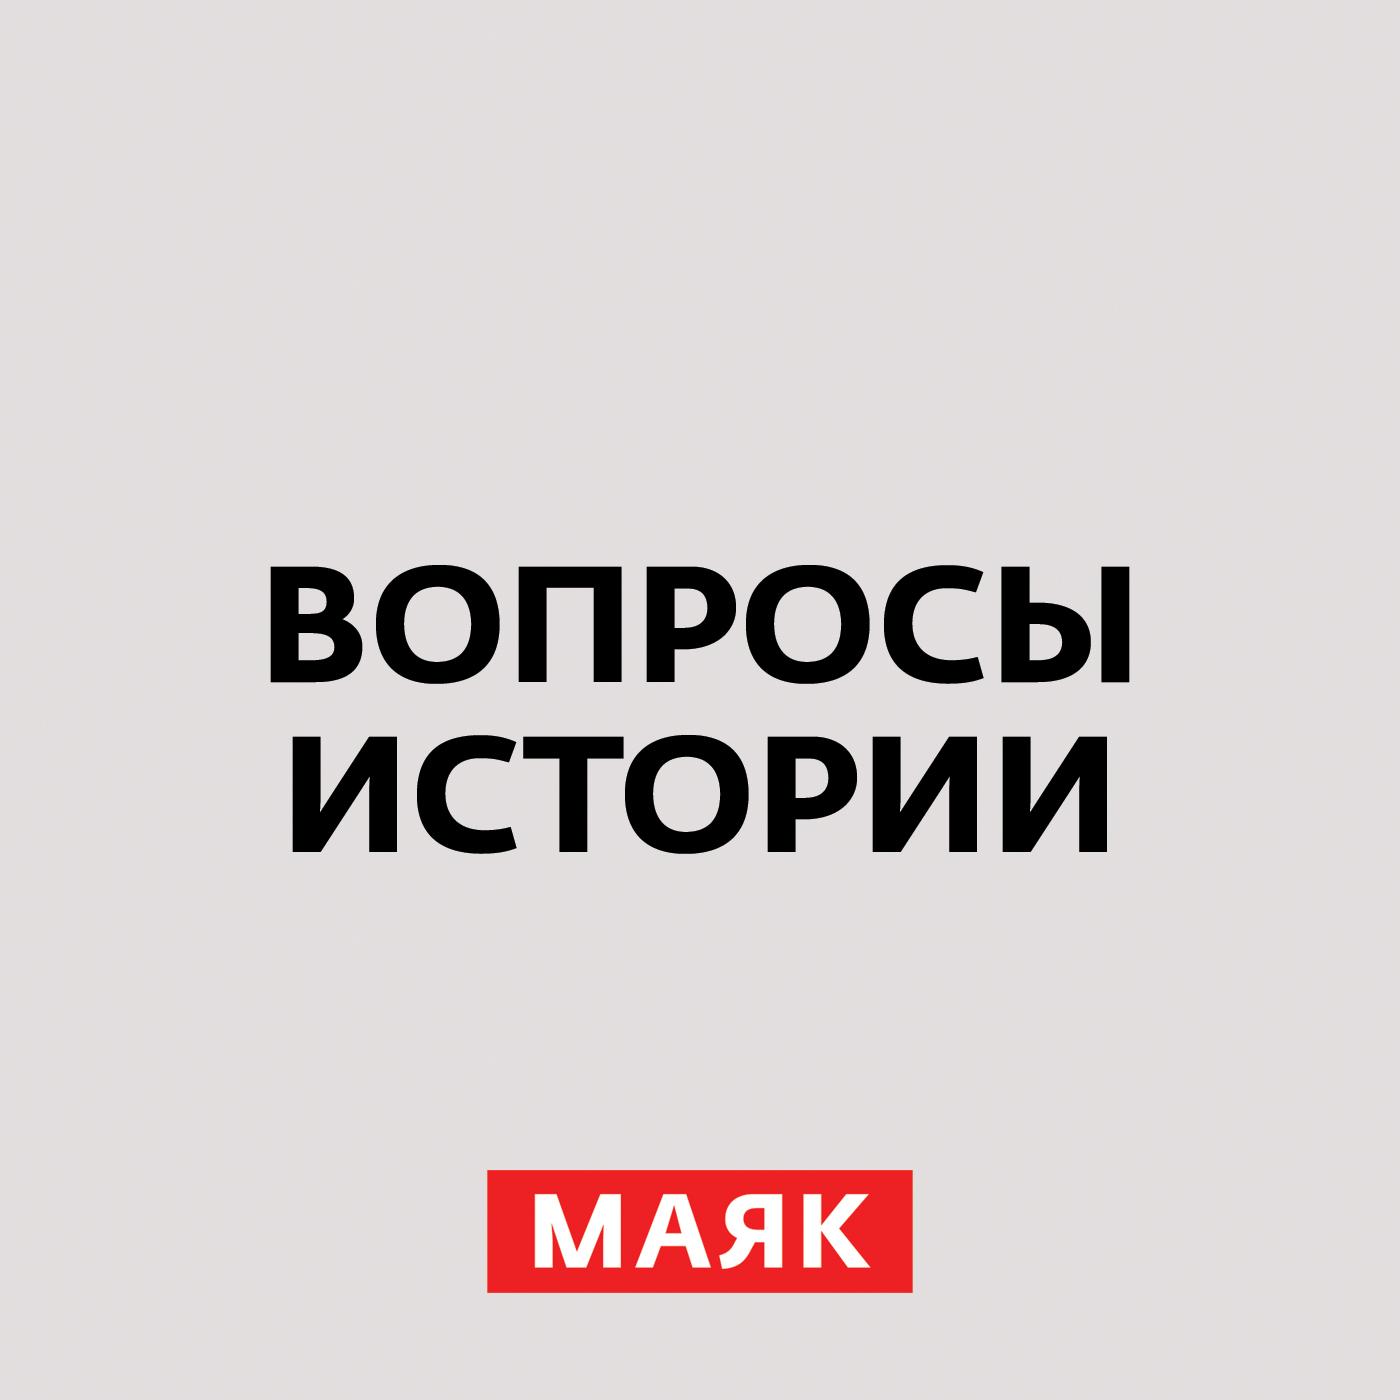 Андрей Светенко Осень 1941-го: Крещатик и Бабий Яр. Часть 2 кузнецов анатолий васильевич бабий яр